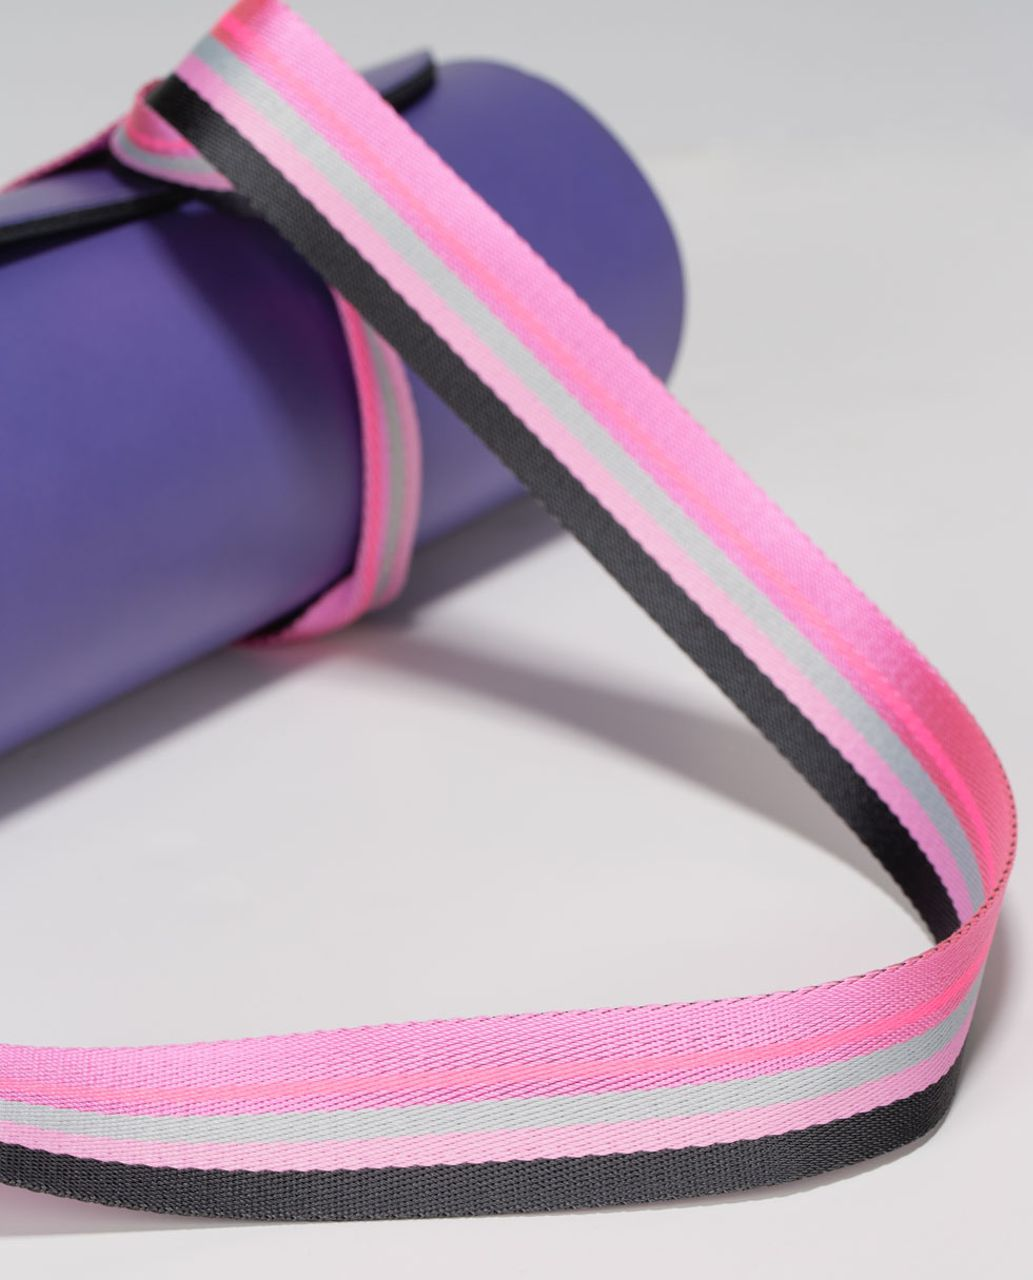 Lululemon Loop It Up Mat Strap - Soot / Vintage Pink / Silver Spoon / Vintage Pink / Zing Pink Light